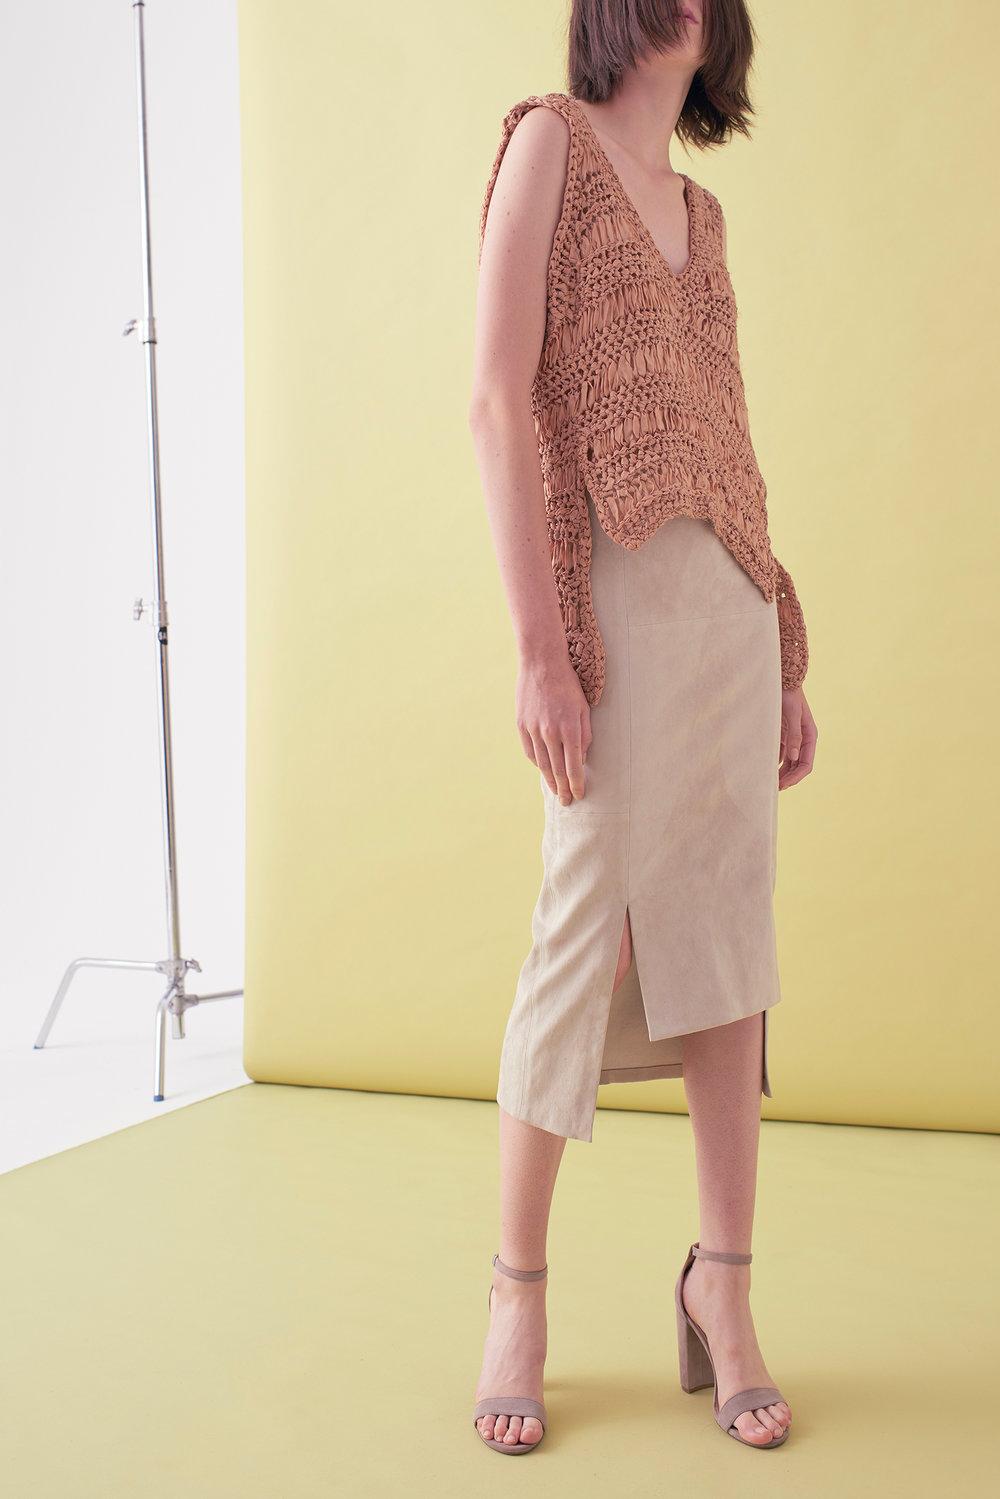 Sarah_Swann_SS17_12_Ribbon_Hand_Crochet_V-neck_Vest_Cosmetic_F.jpg